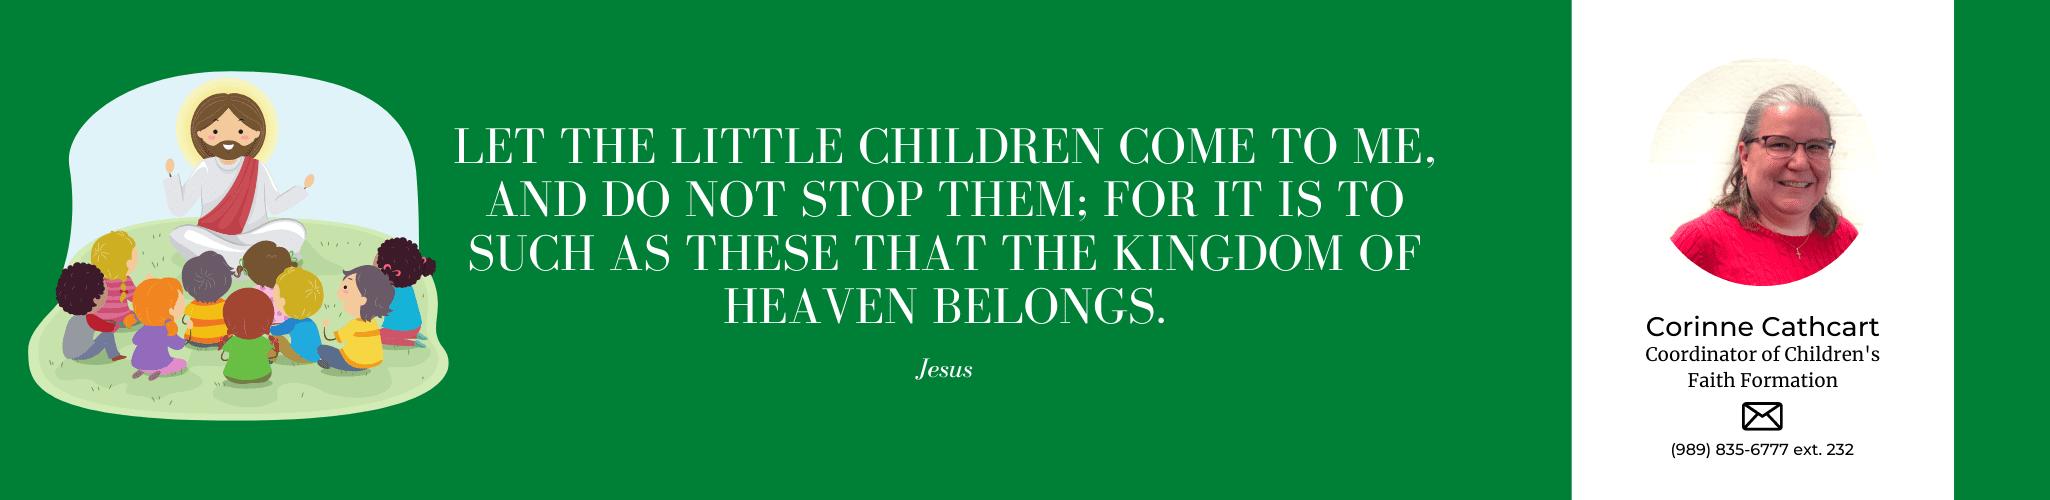 Corinne Cathcart Coordinator of Children's Faith Formation Phone: 989-835-6777 ext 232